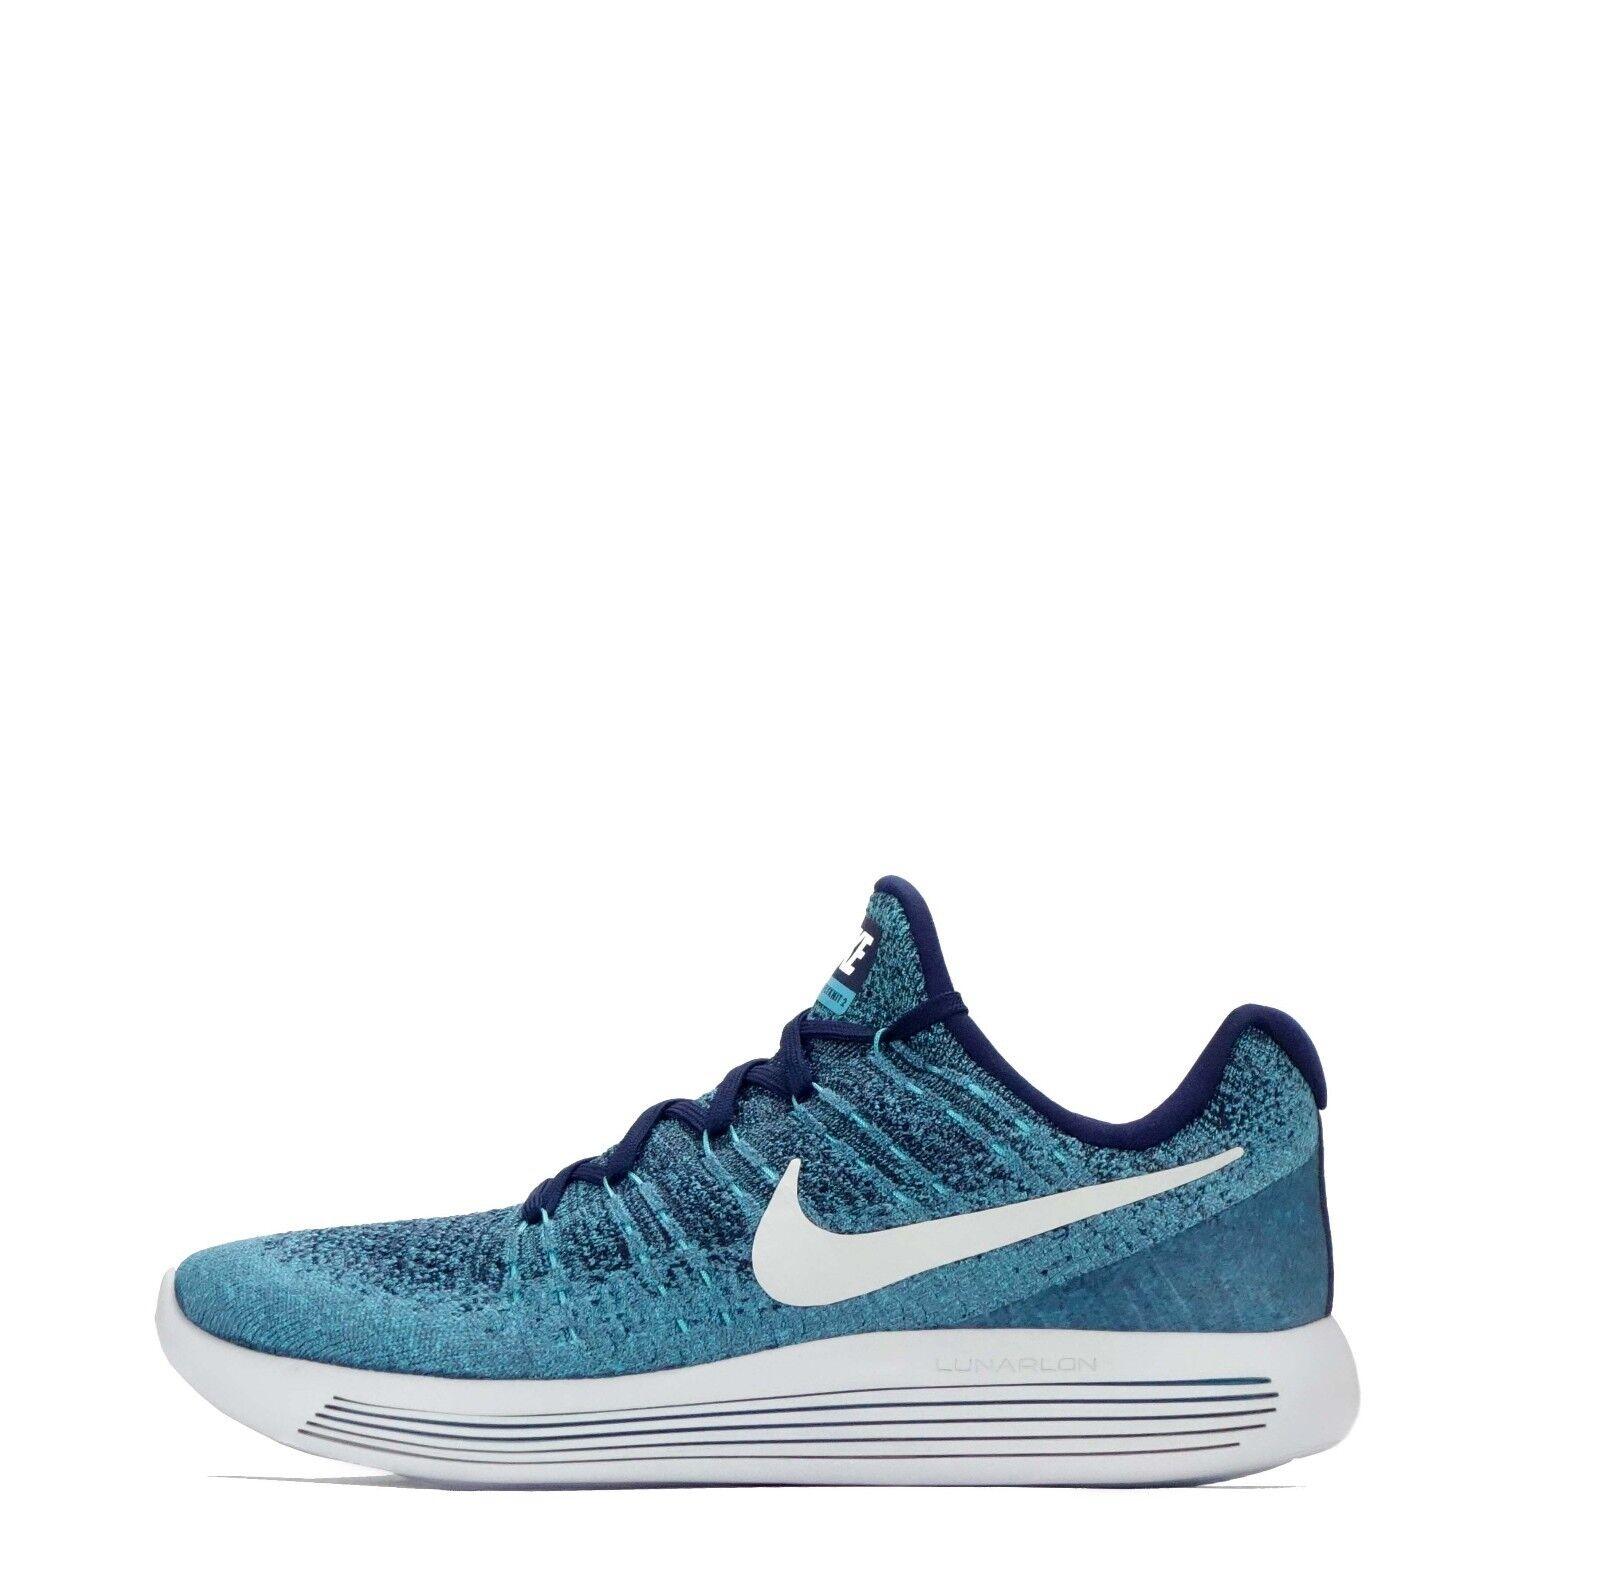 Nike LUNAREPIC Basse Flyknit 2 Uomo LEGGERE SPORTIVE Scarpe da corsa blu/Bianco